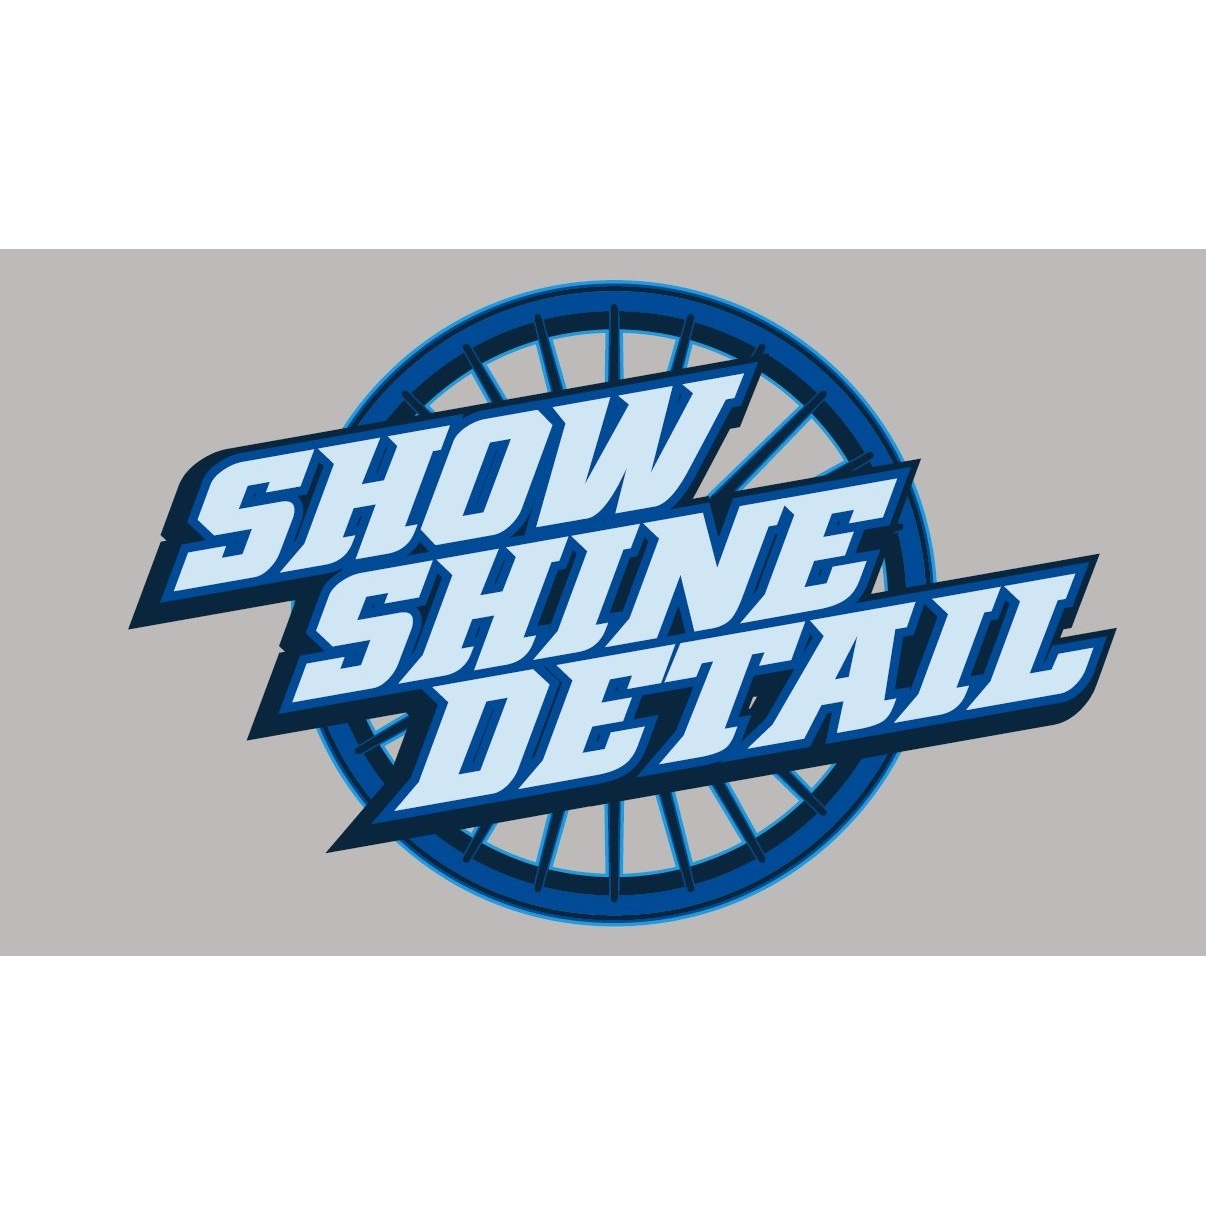 Show Shine Detail